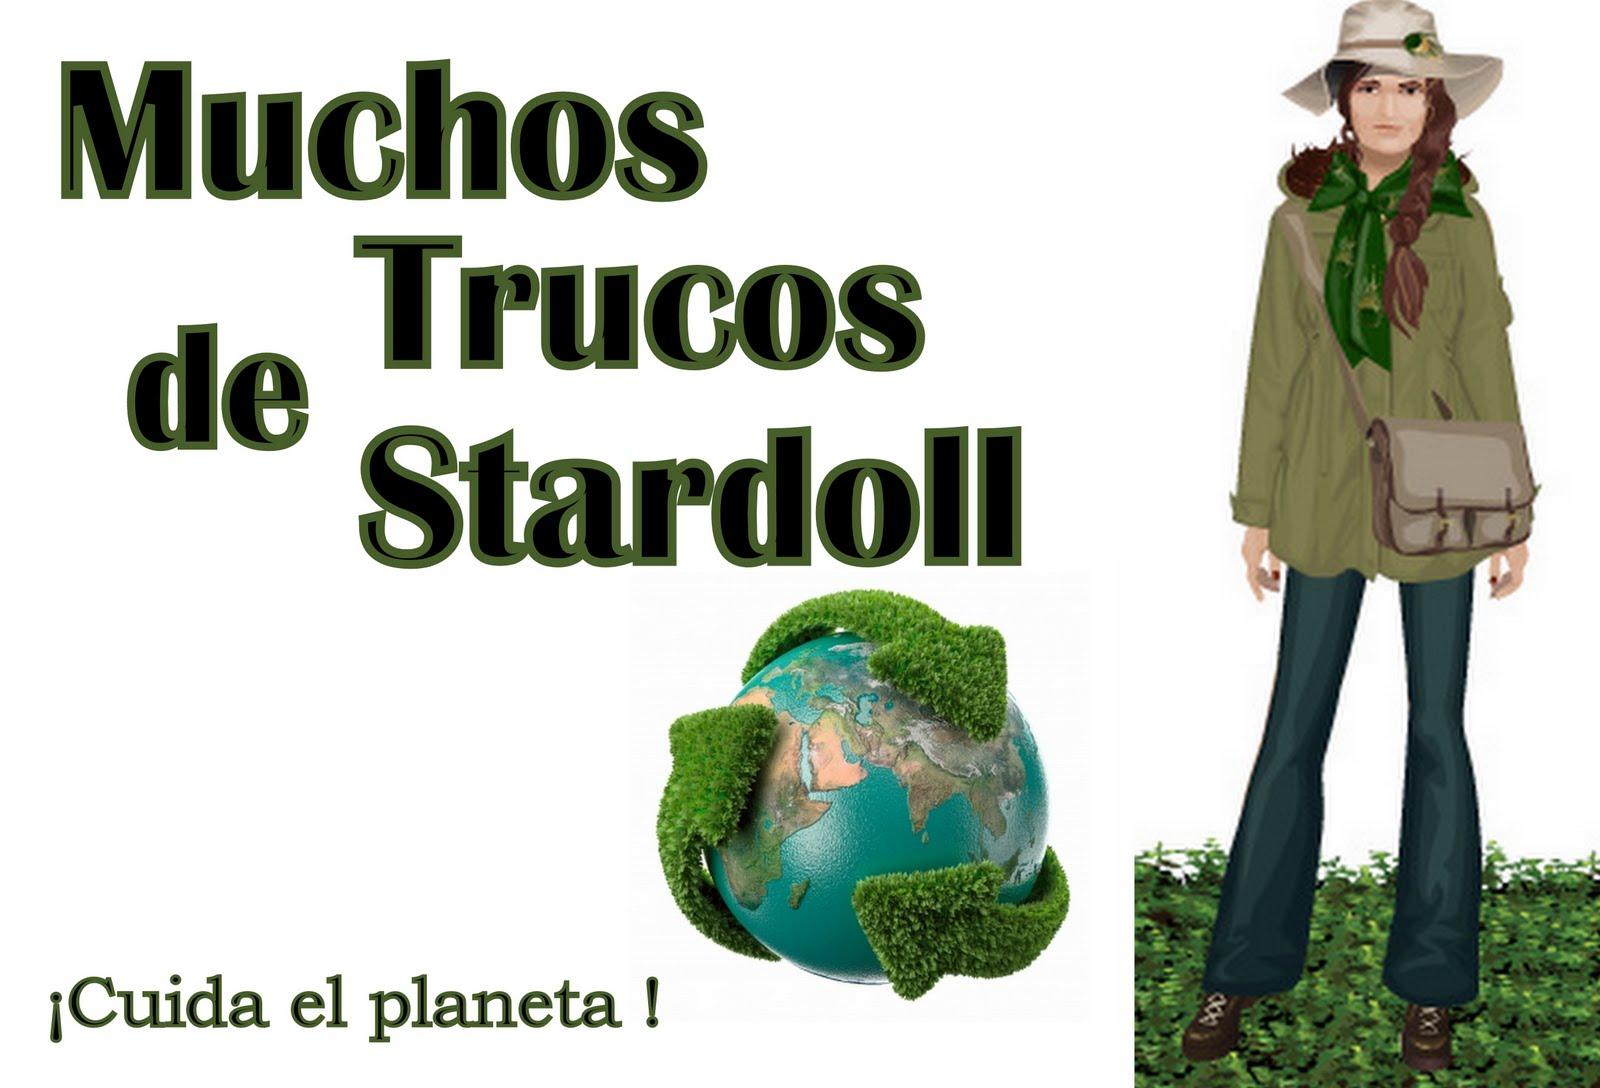 MuchoS Trucos de StaRdoll - Tu web ecológica de Stardoll